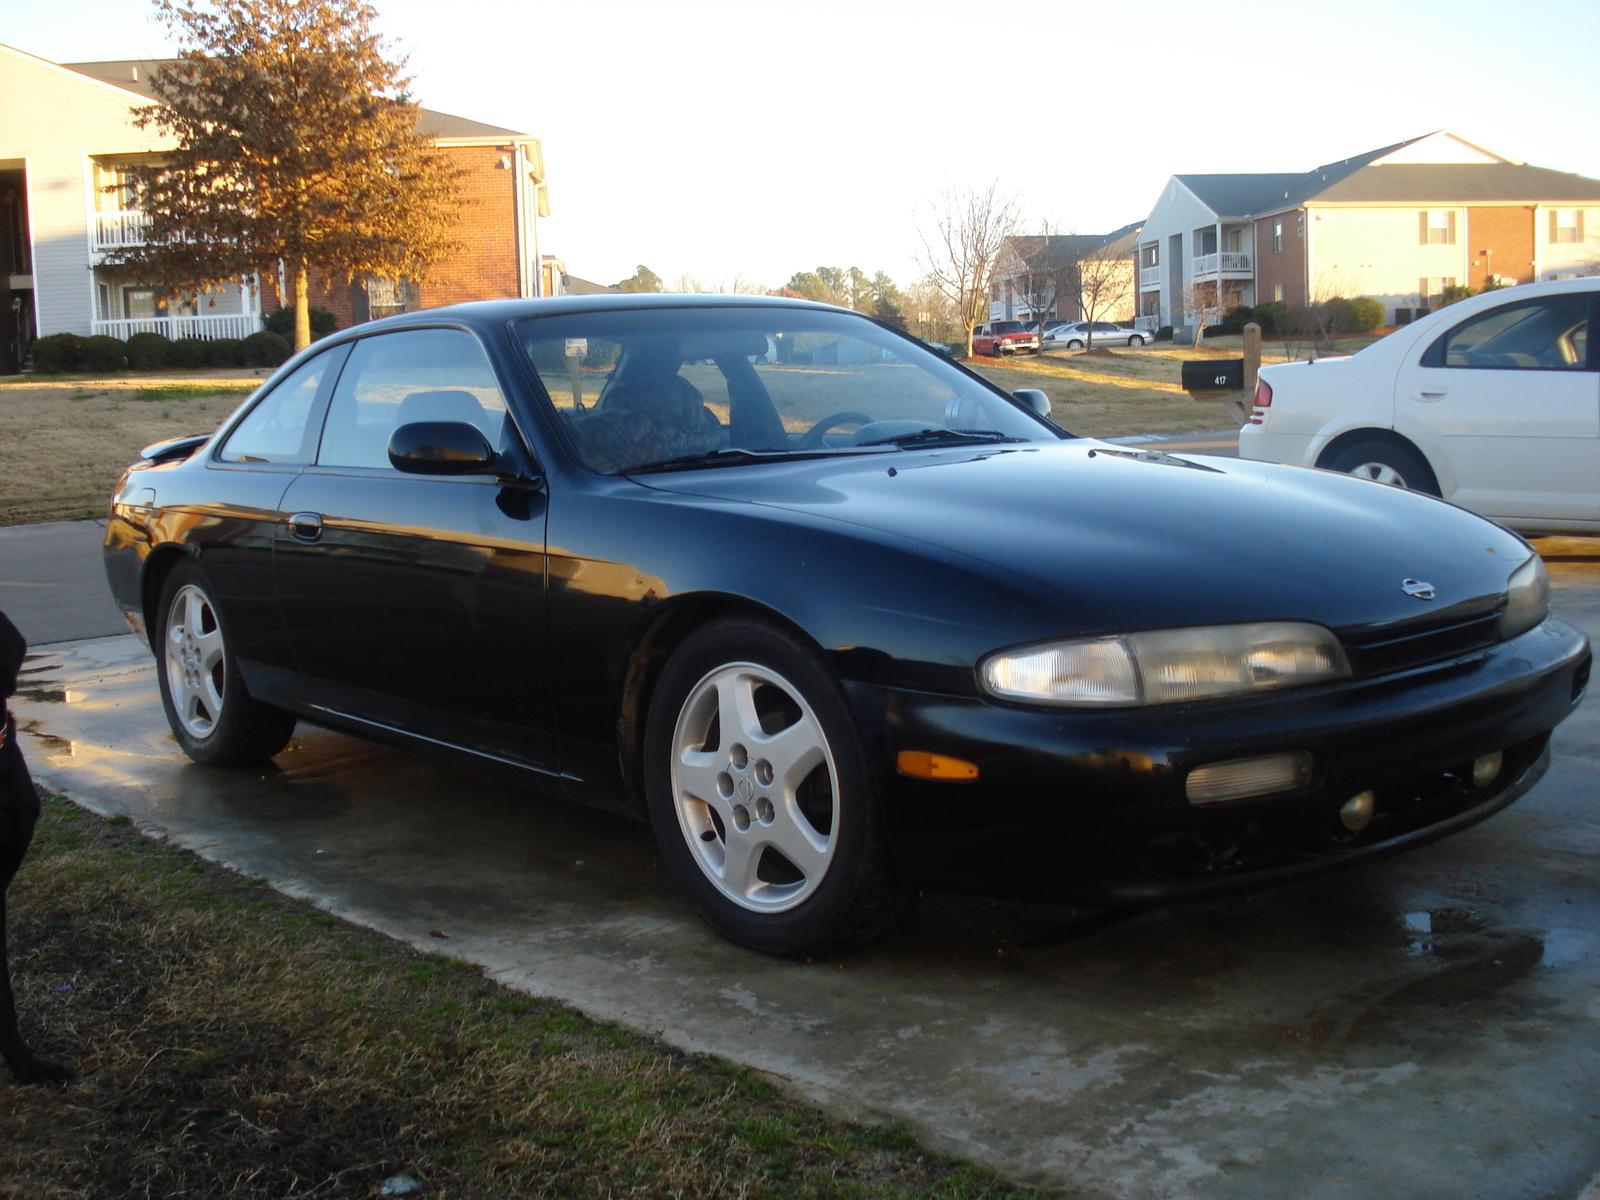 1996 Nissan 240sx Pictures Cargurus